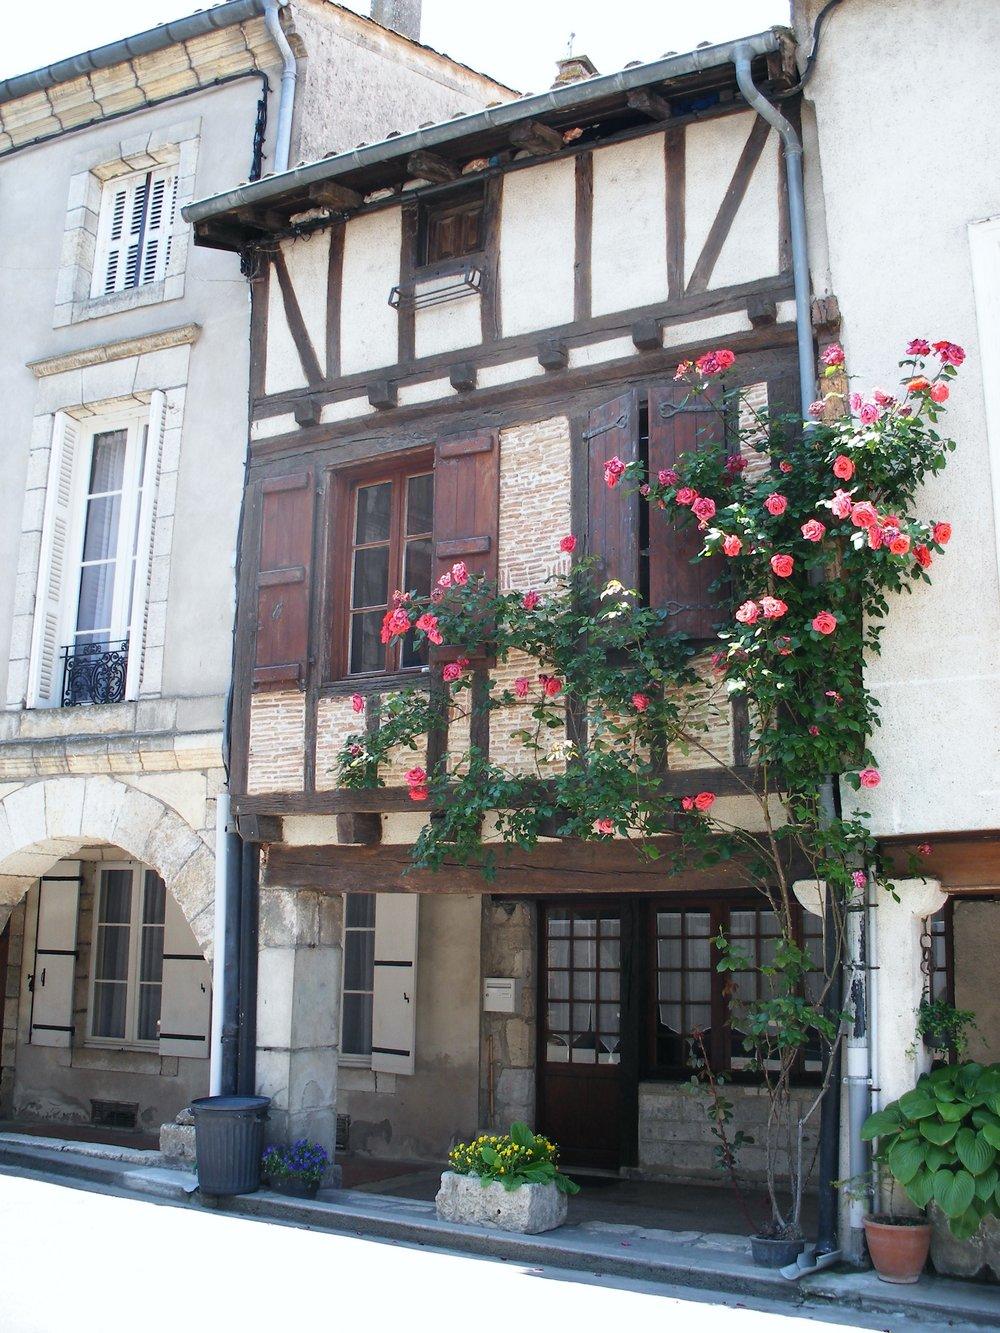 maison-colombage-fleuri-beauville-ot-paps.jpg